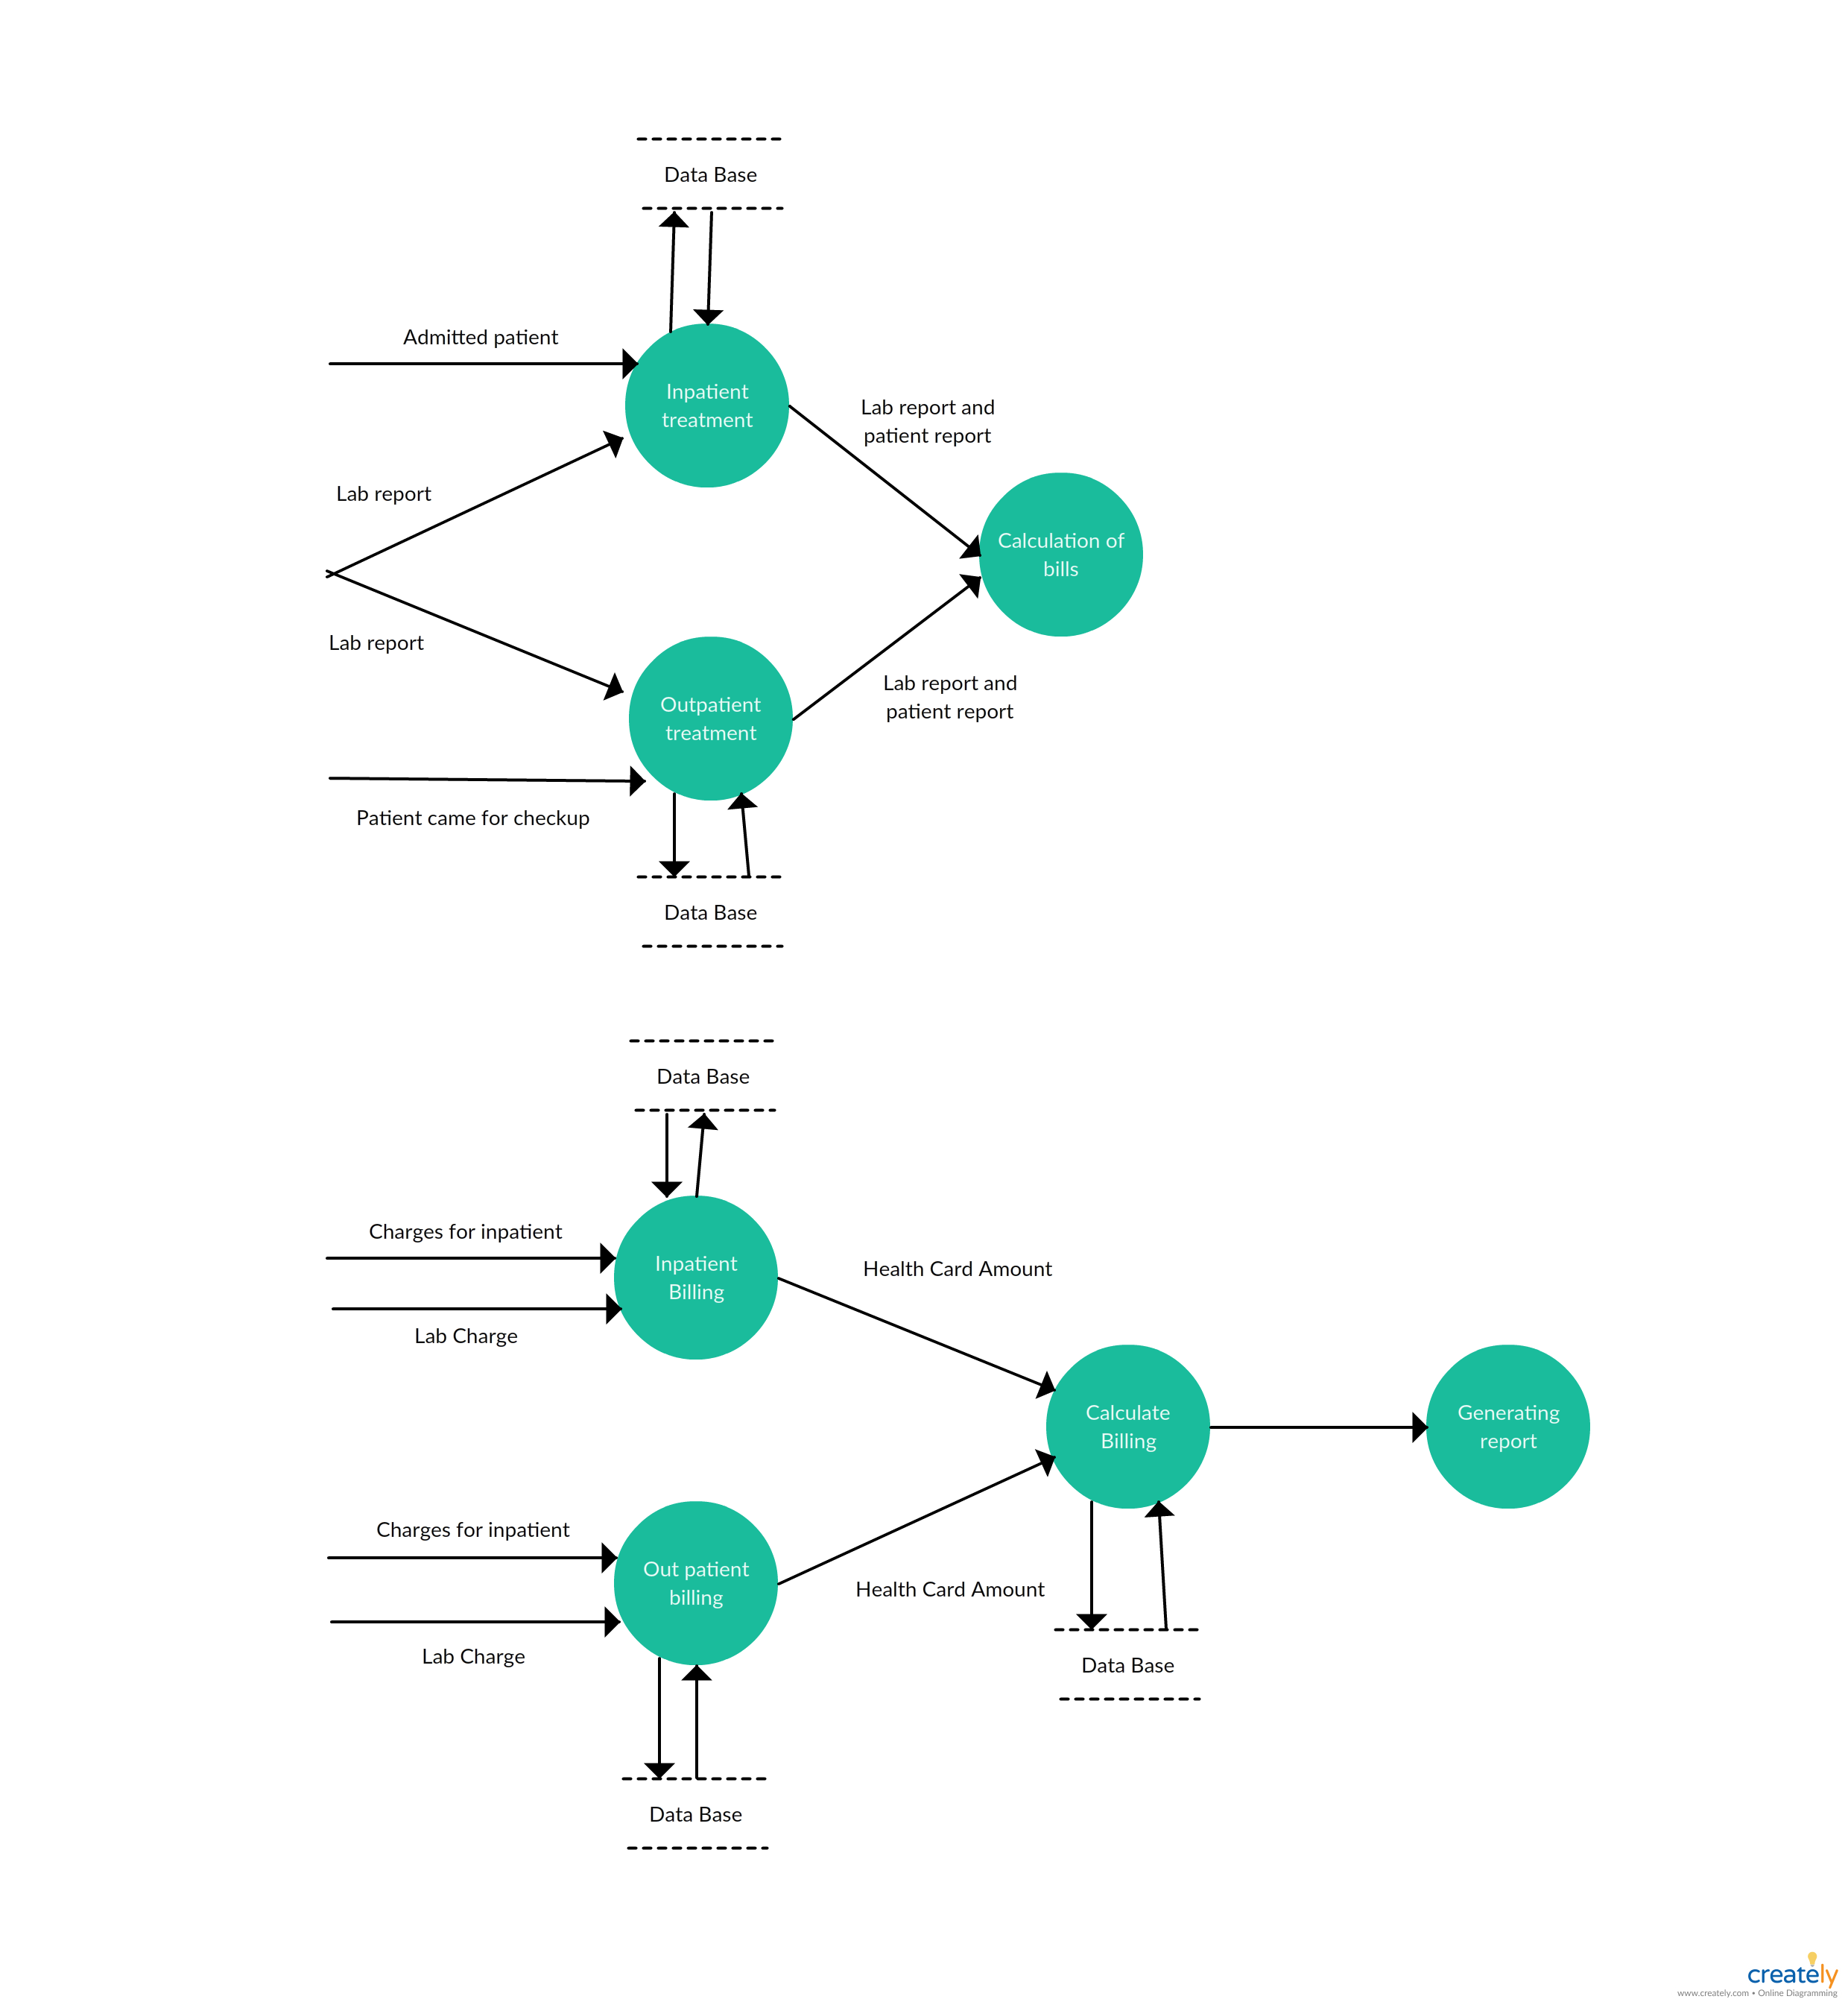 Level 2 - Data Flow Diagram Template For Hospital Management